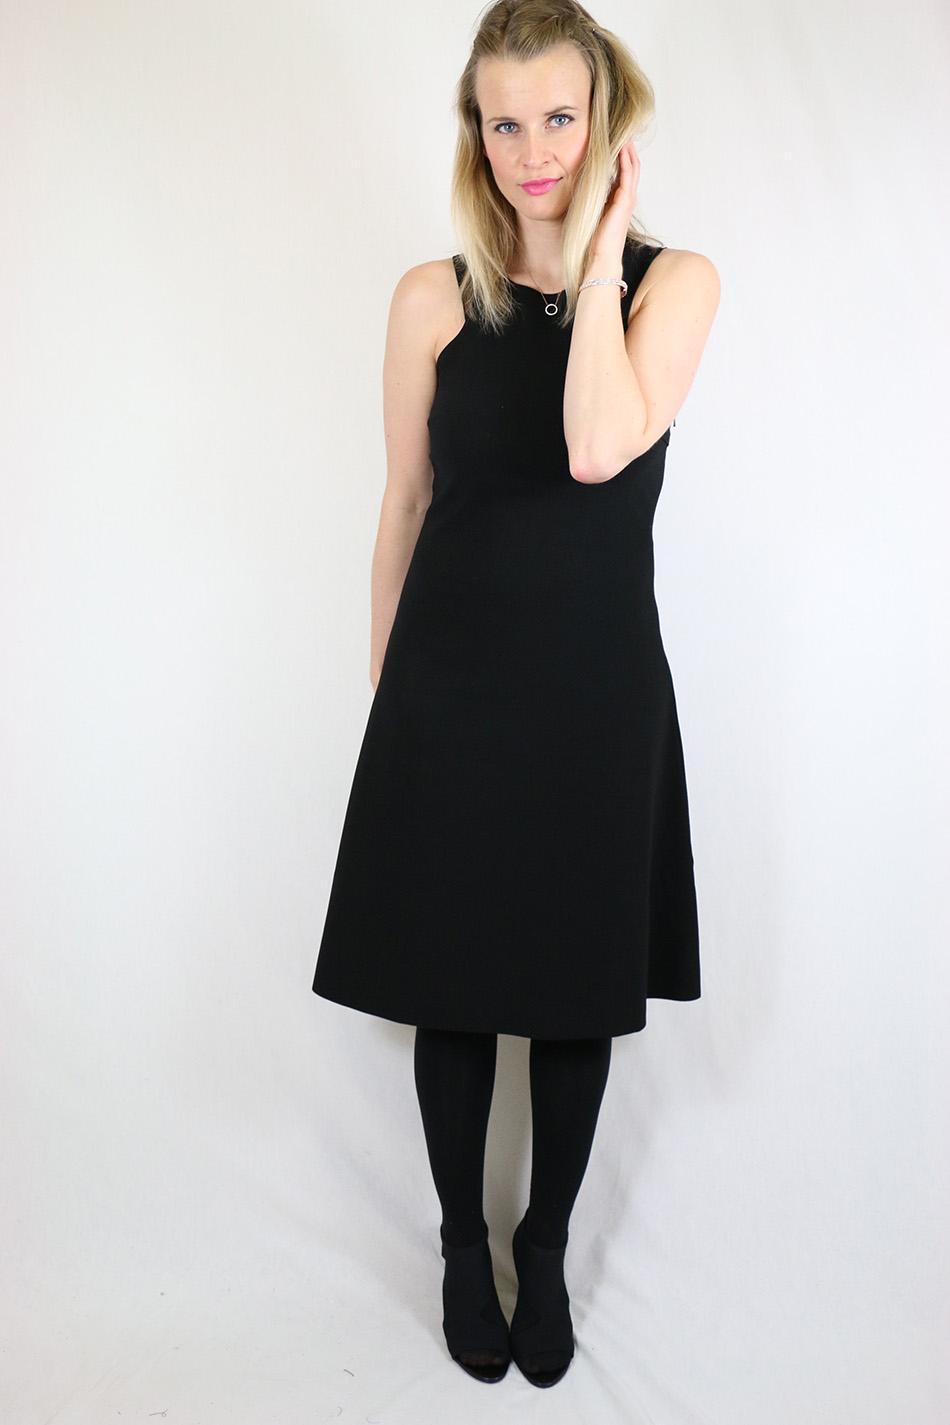 Fringe and Doll Black A-line dress IMG_1688